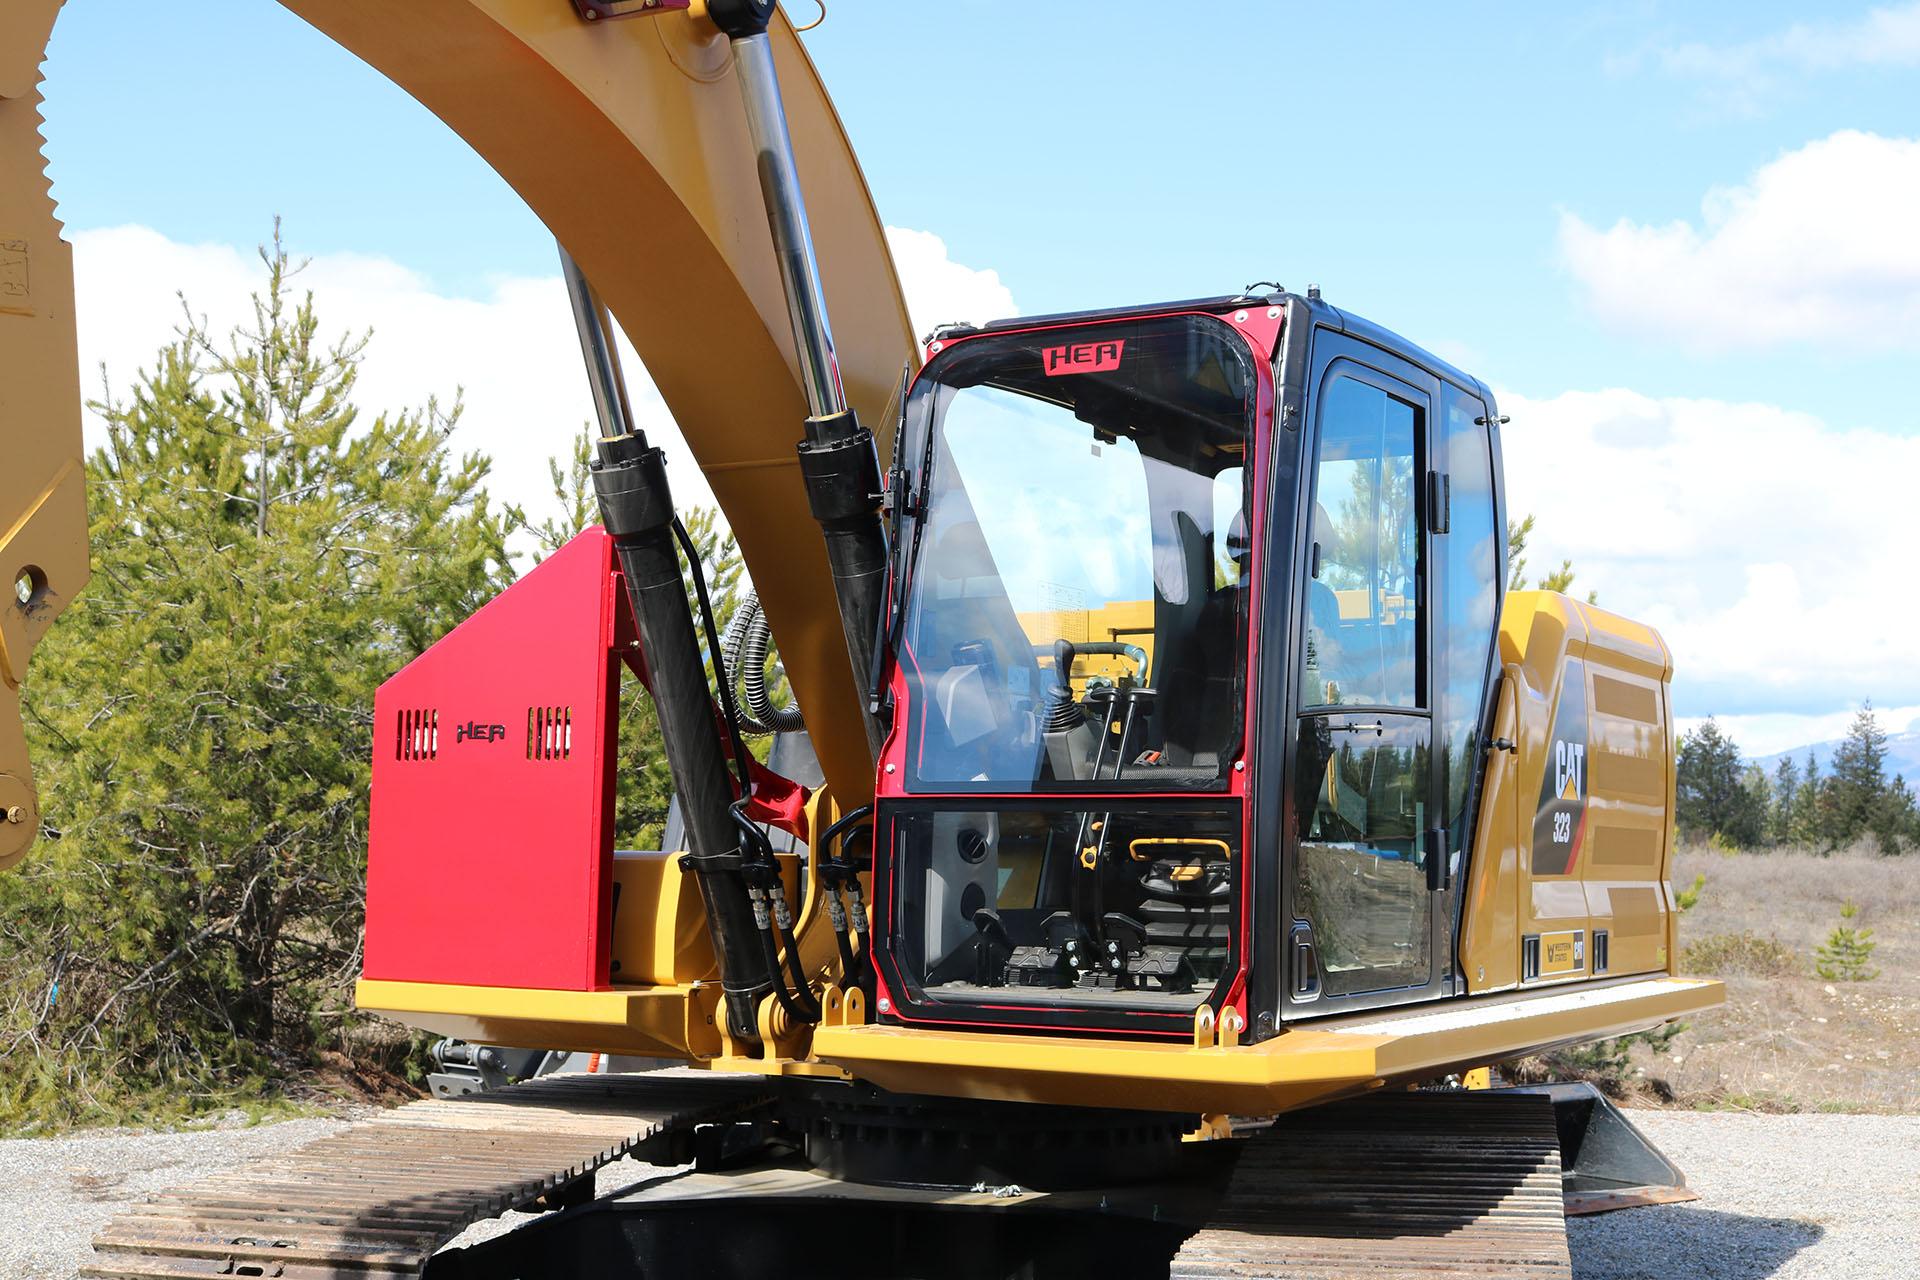 Demolition Guards for Excavators